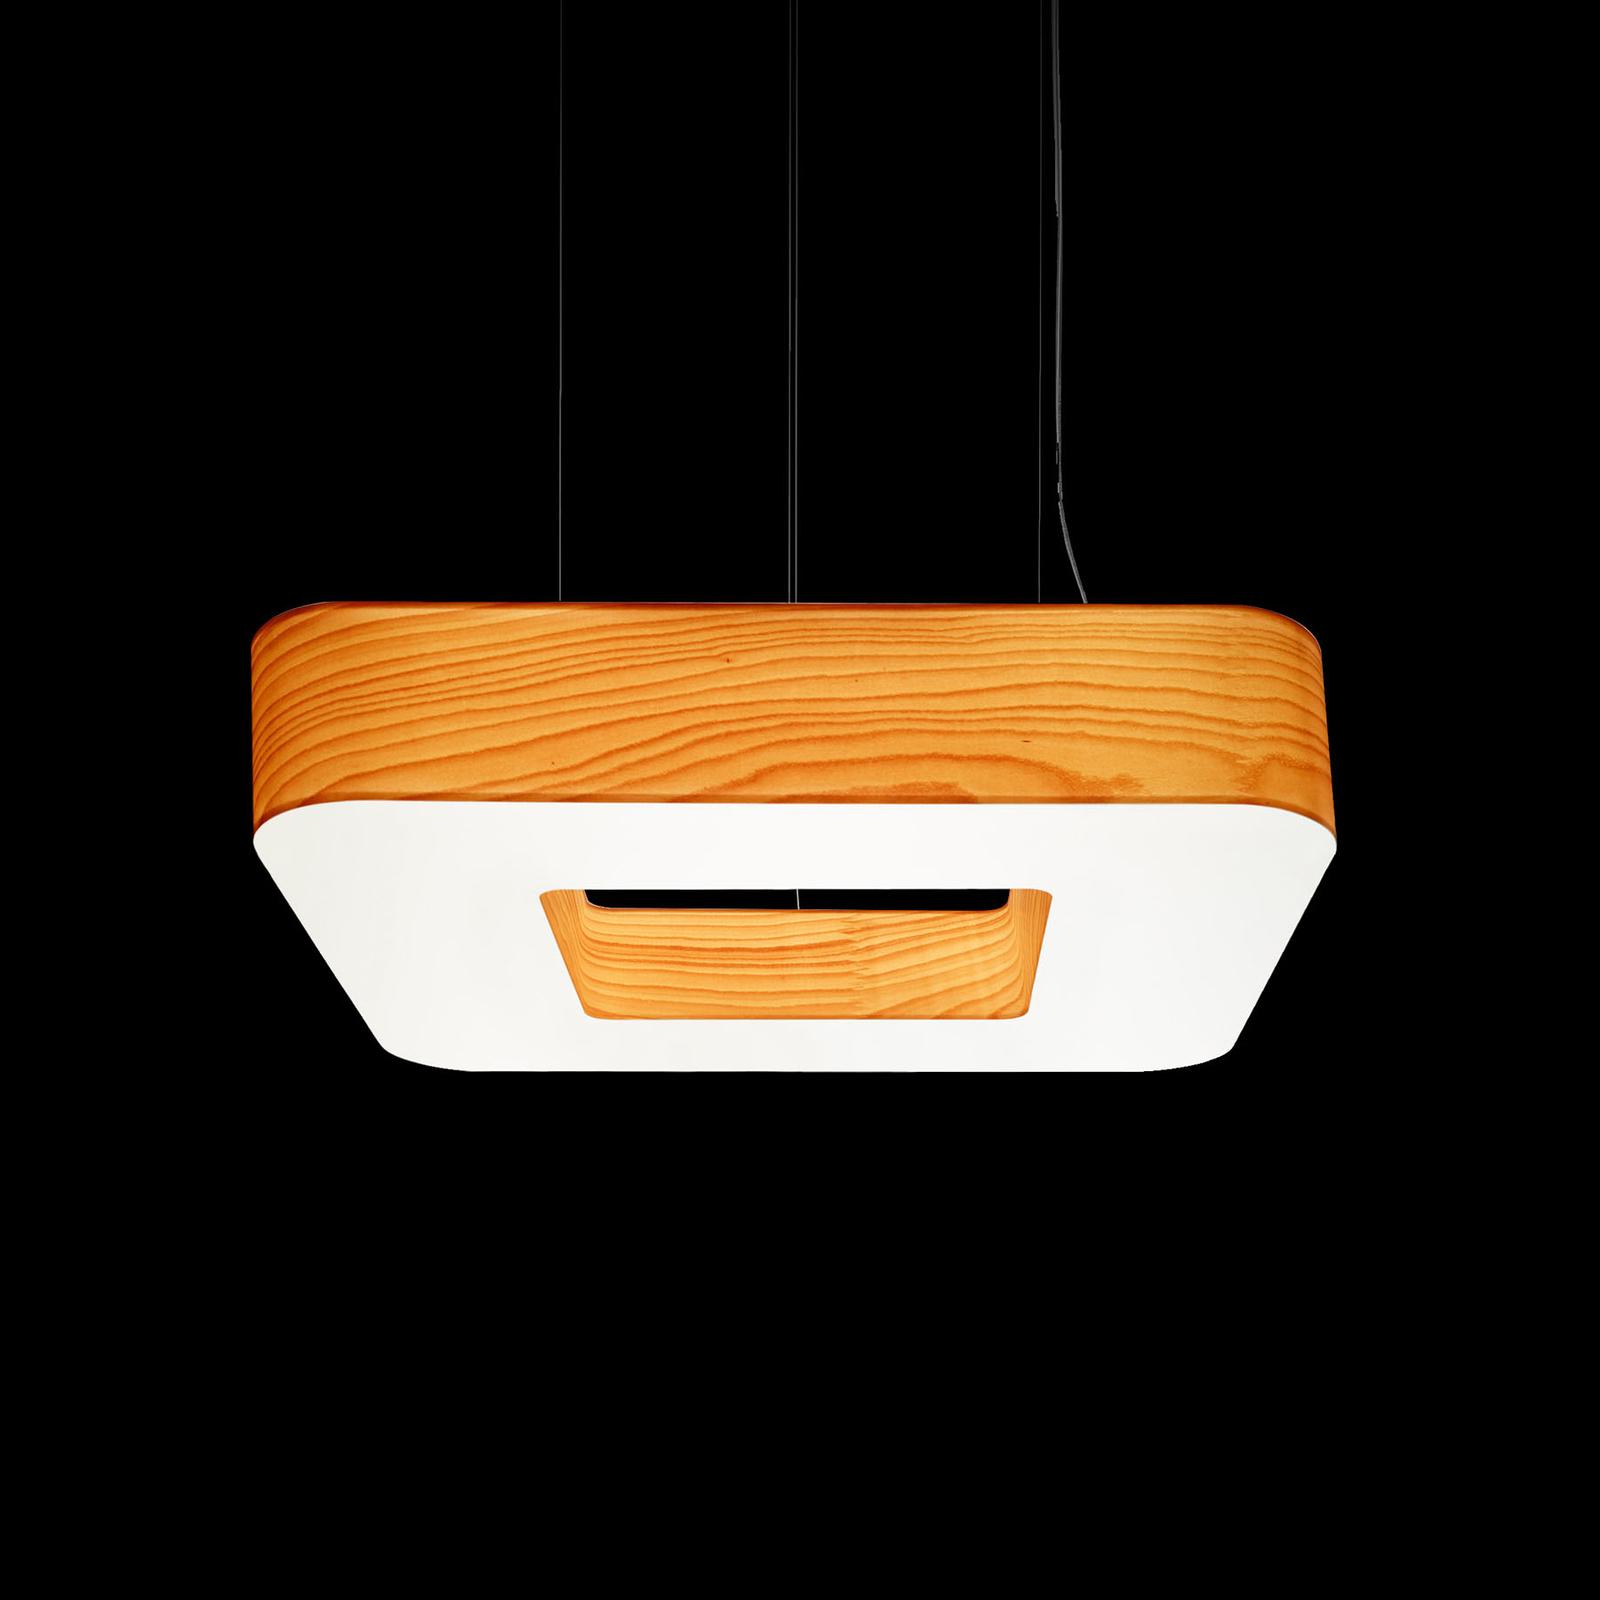 LZF Cuad LED a sospensione 0-10V dim, faggio